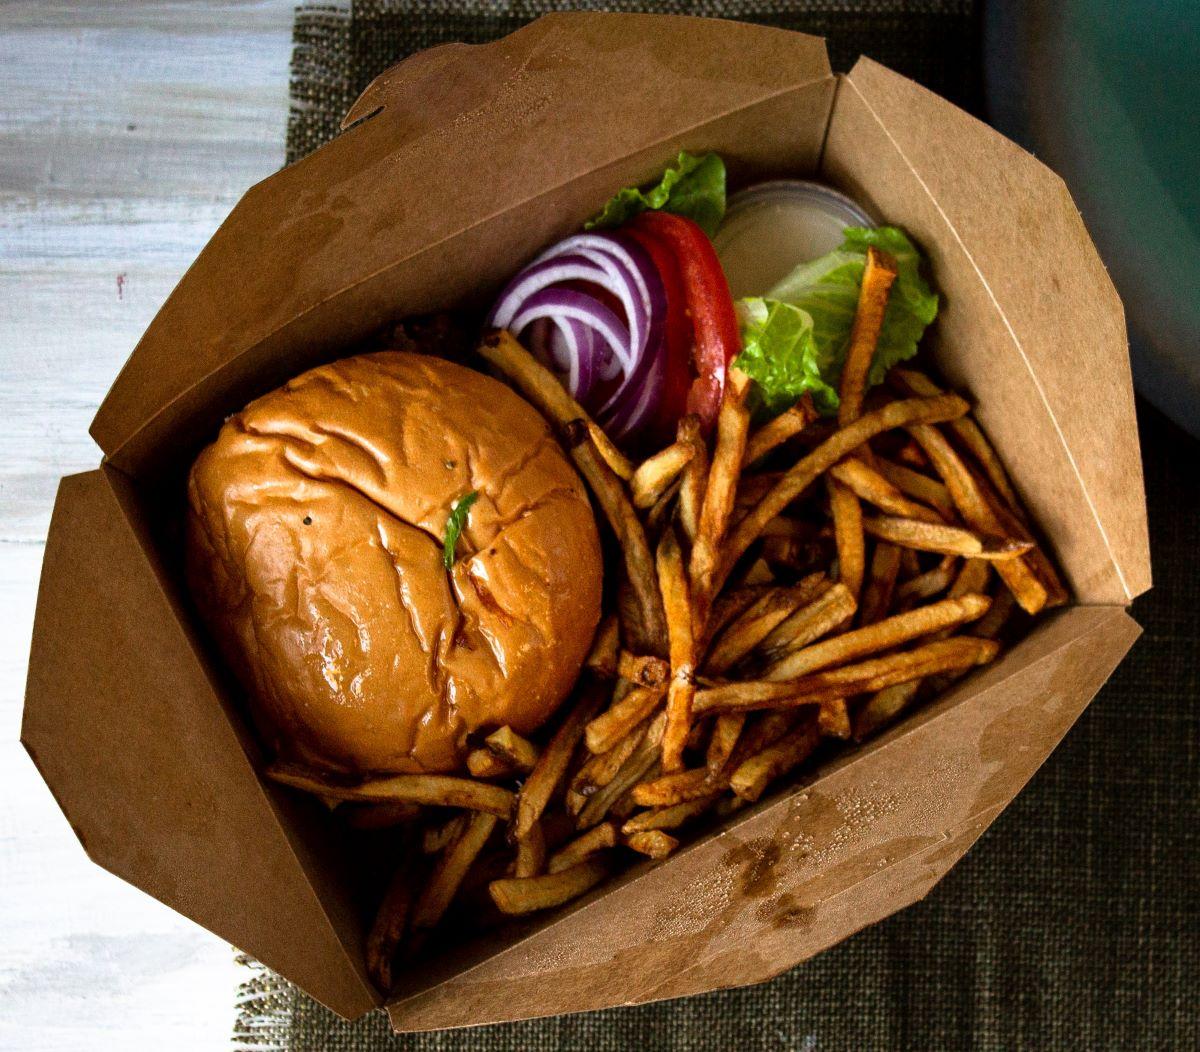 burger from anna maria island spot